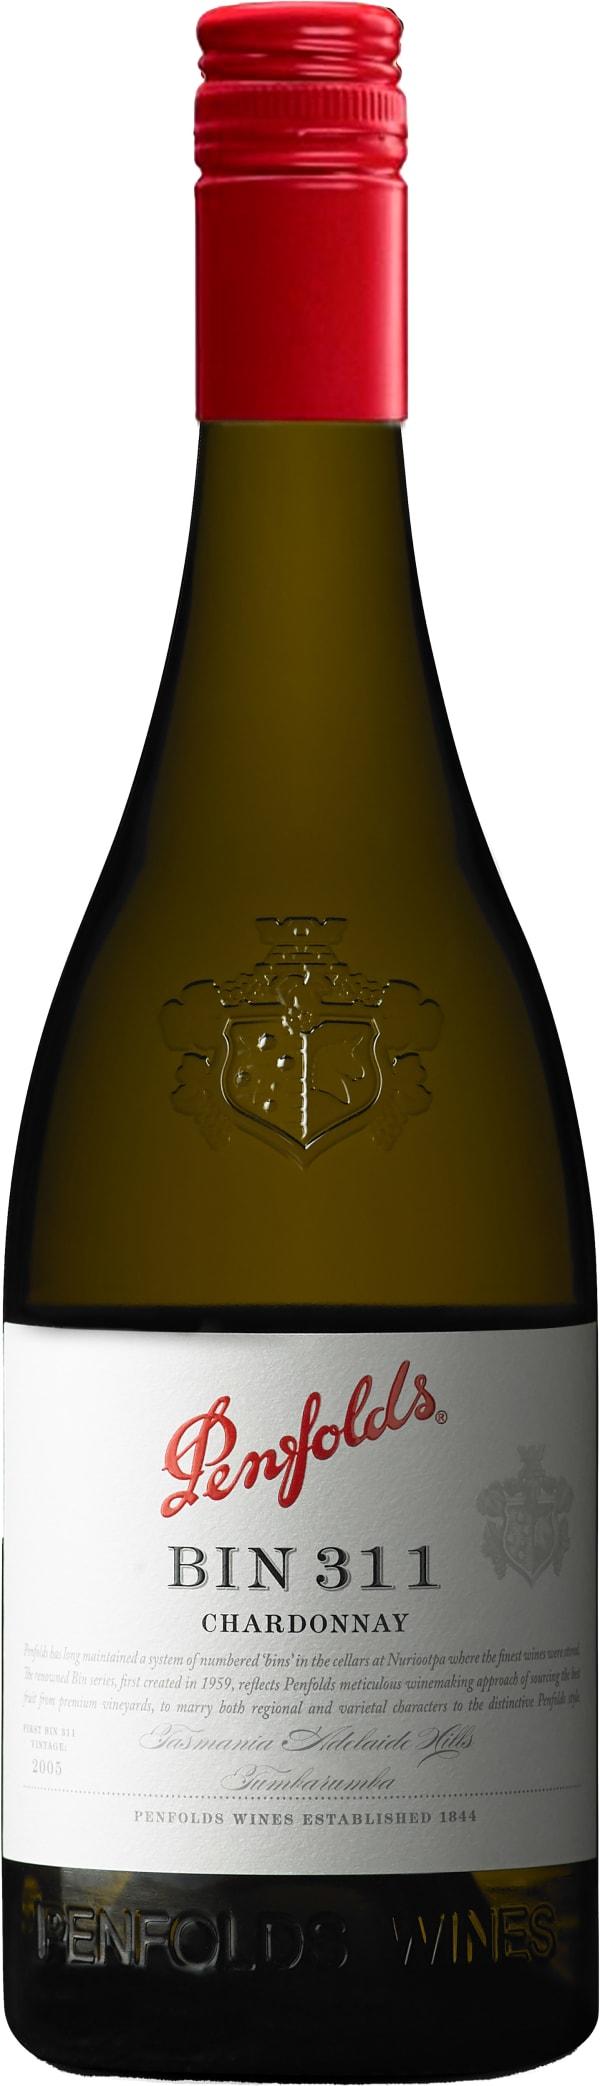 Penfolds BIN 311 Chardonnay 2016